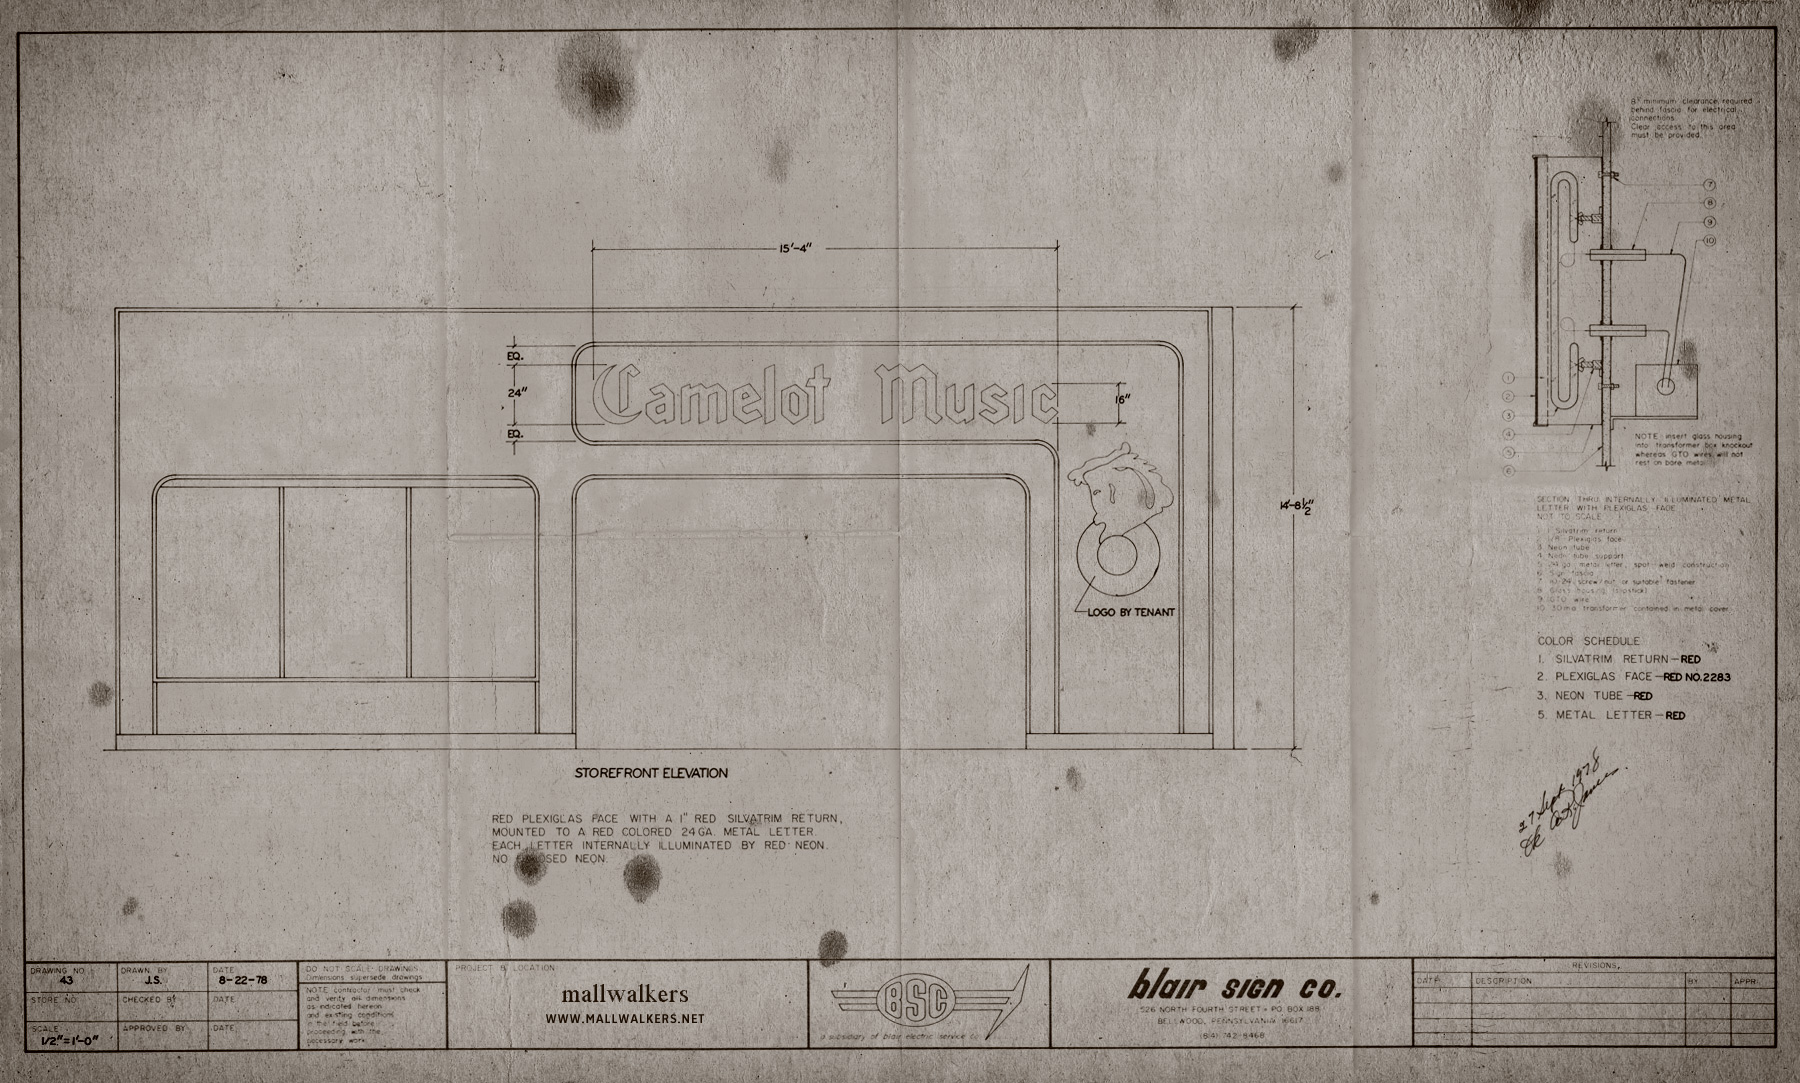 storefront elevation of camelot music 1978